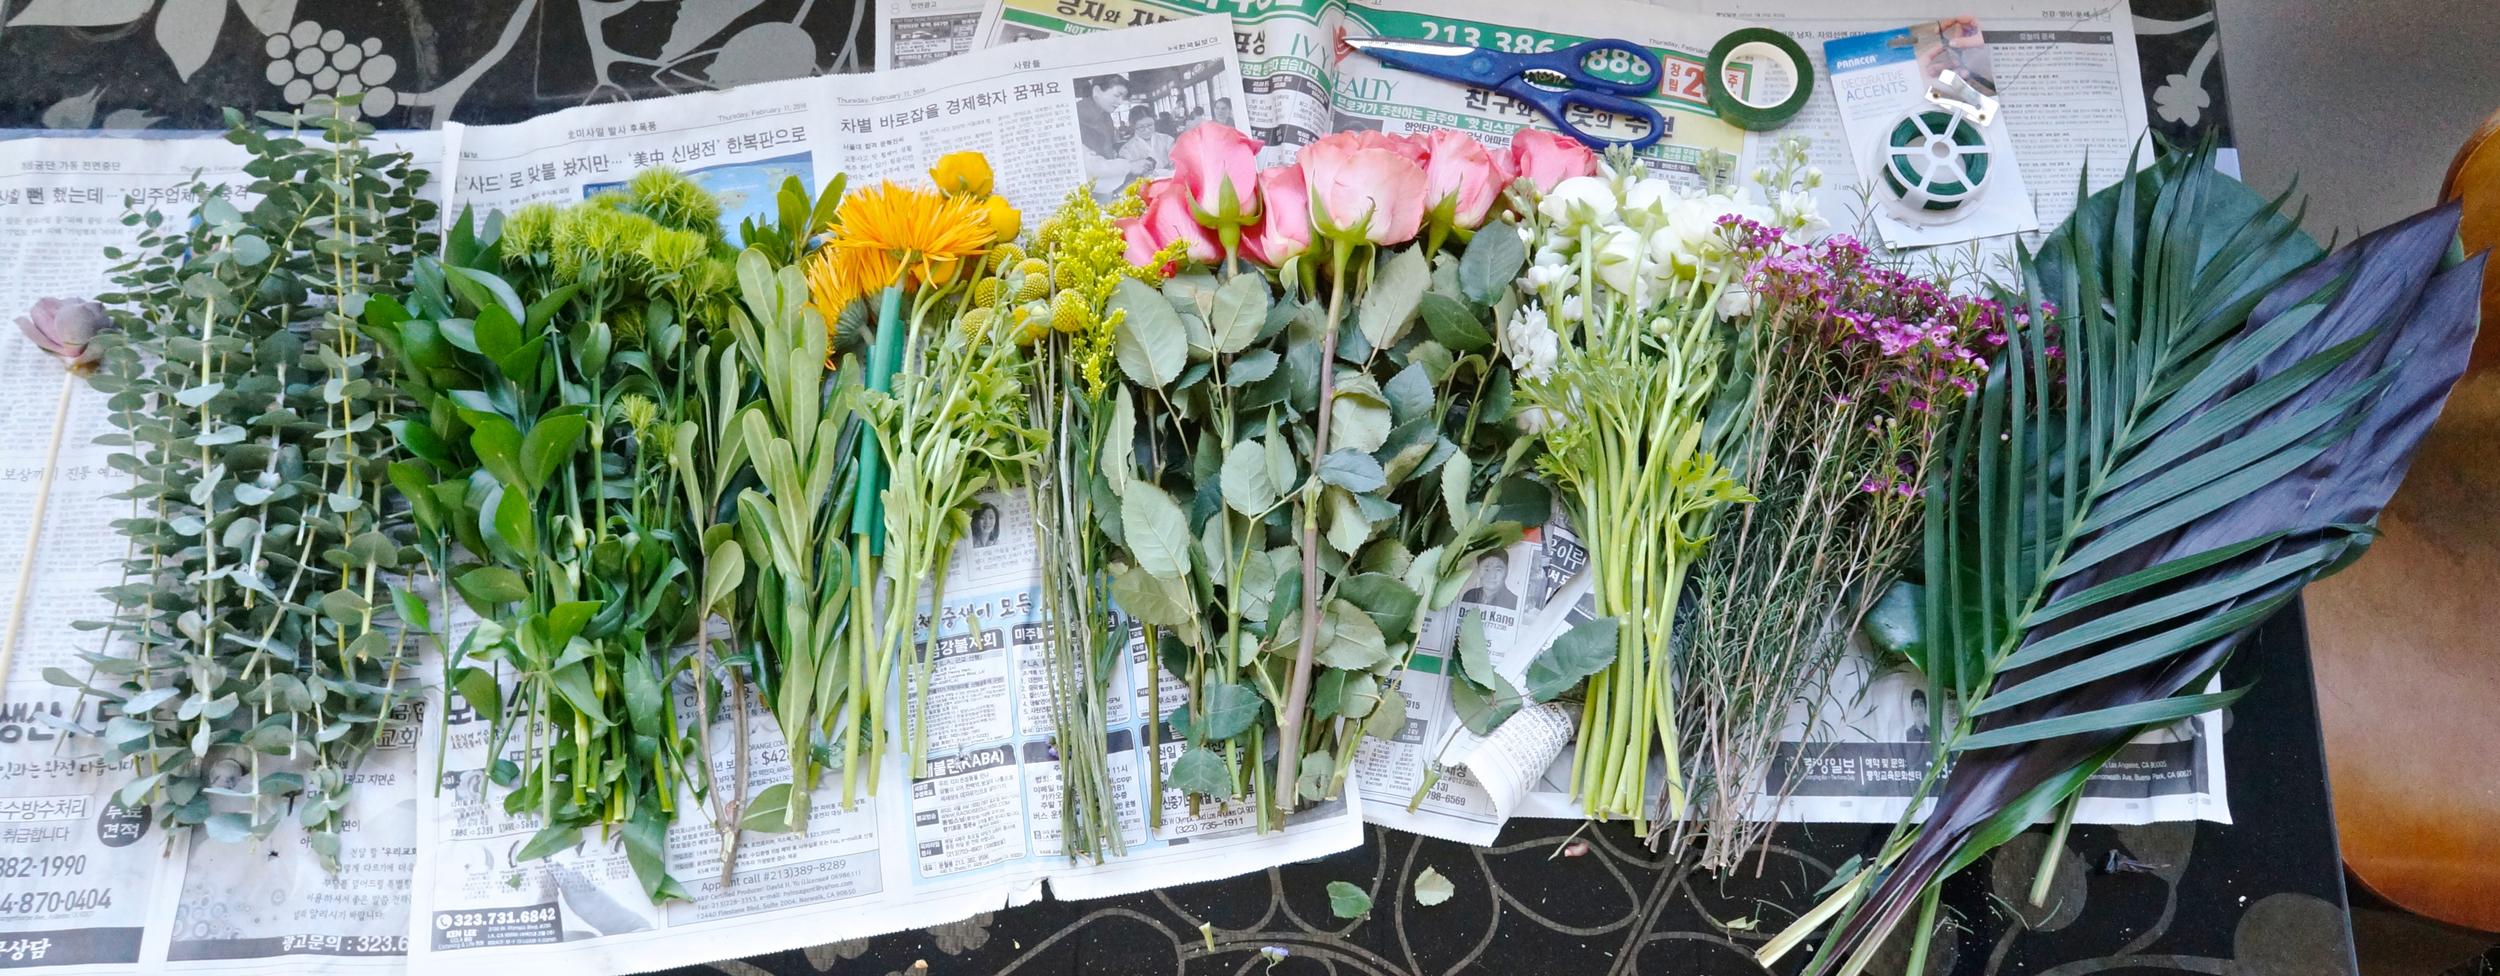 trimmed-flowers-bouquets.jpg